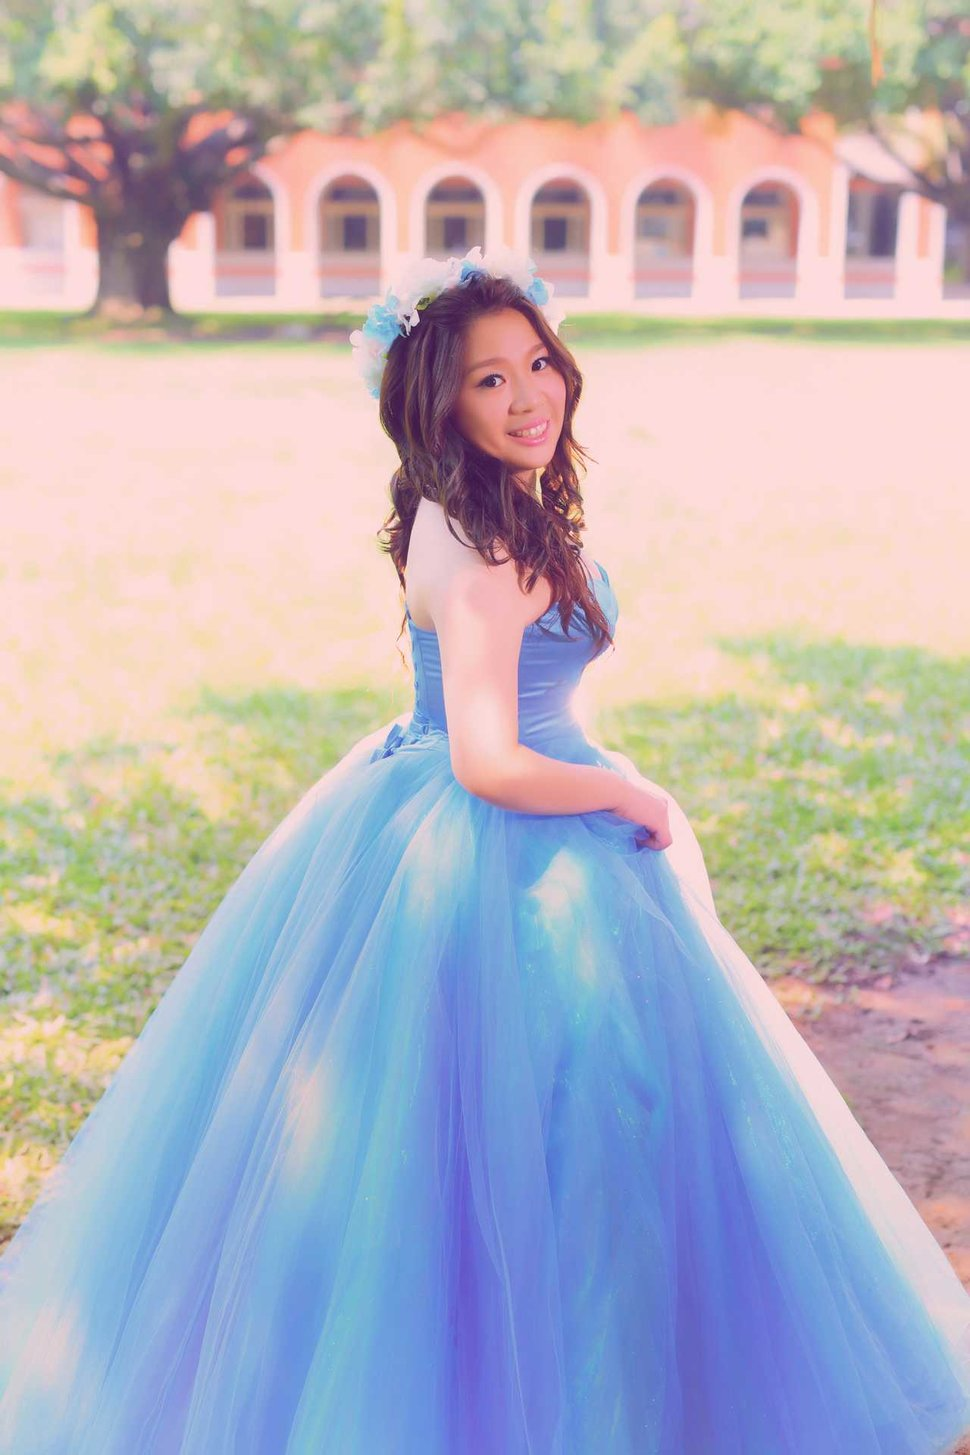 Wedding_Photo_2016_033 - 台南新秘Penny-新娘秘書《結婚吧》